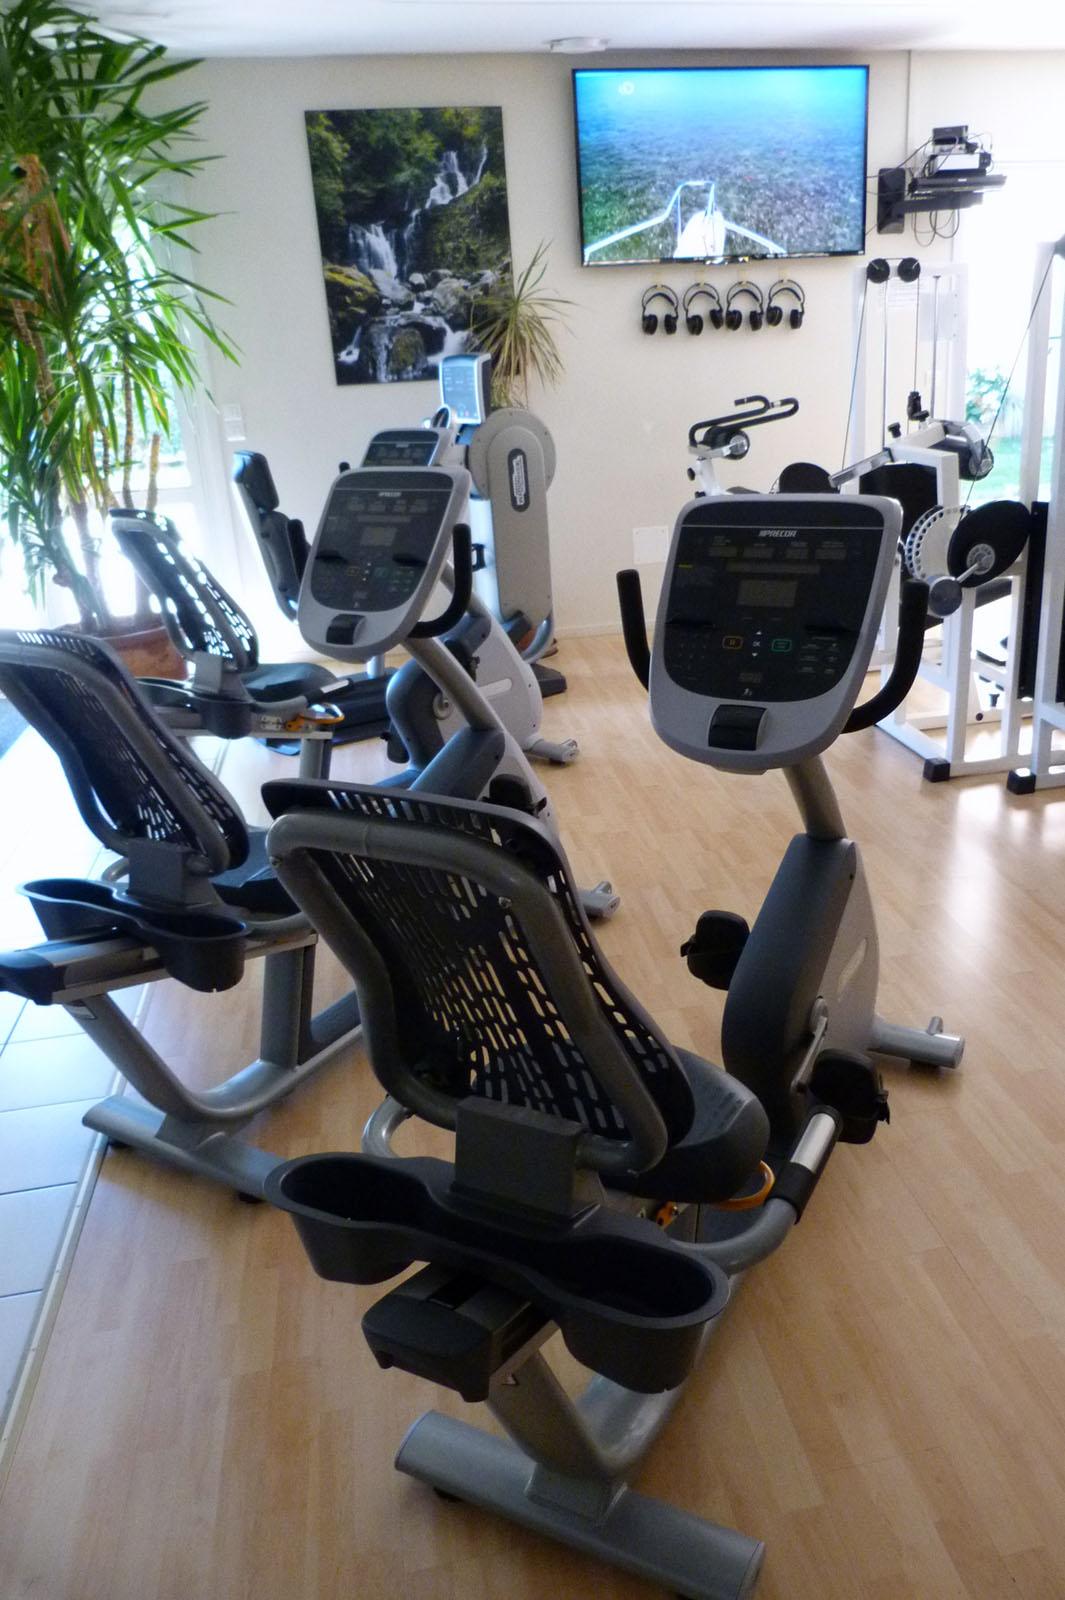 Salle de Sport Bergerac Creysse Vélo semi-allongé RBK 835 Precor 1